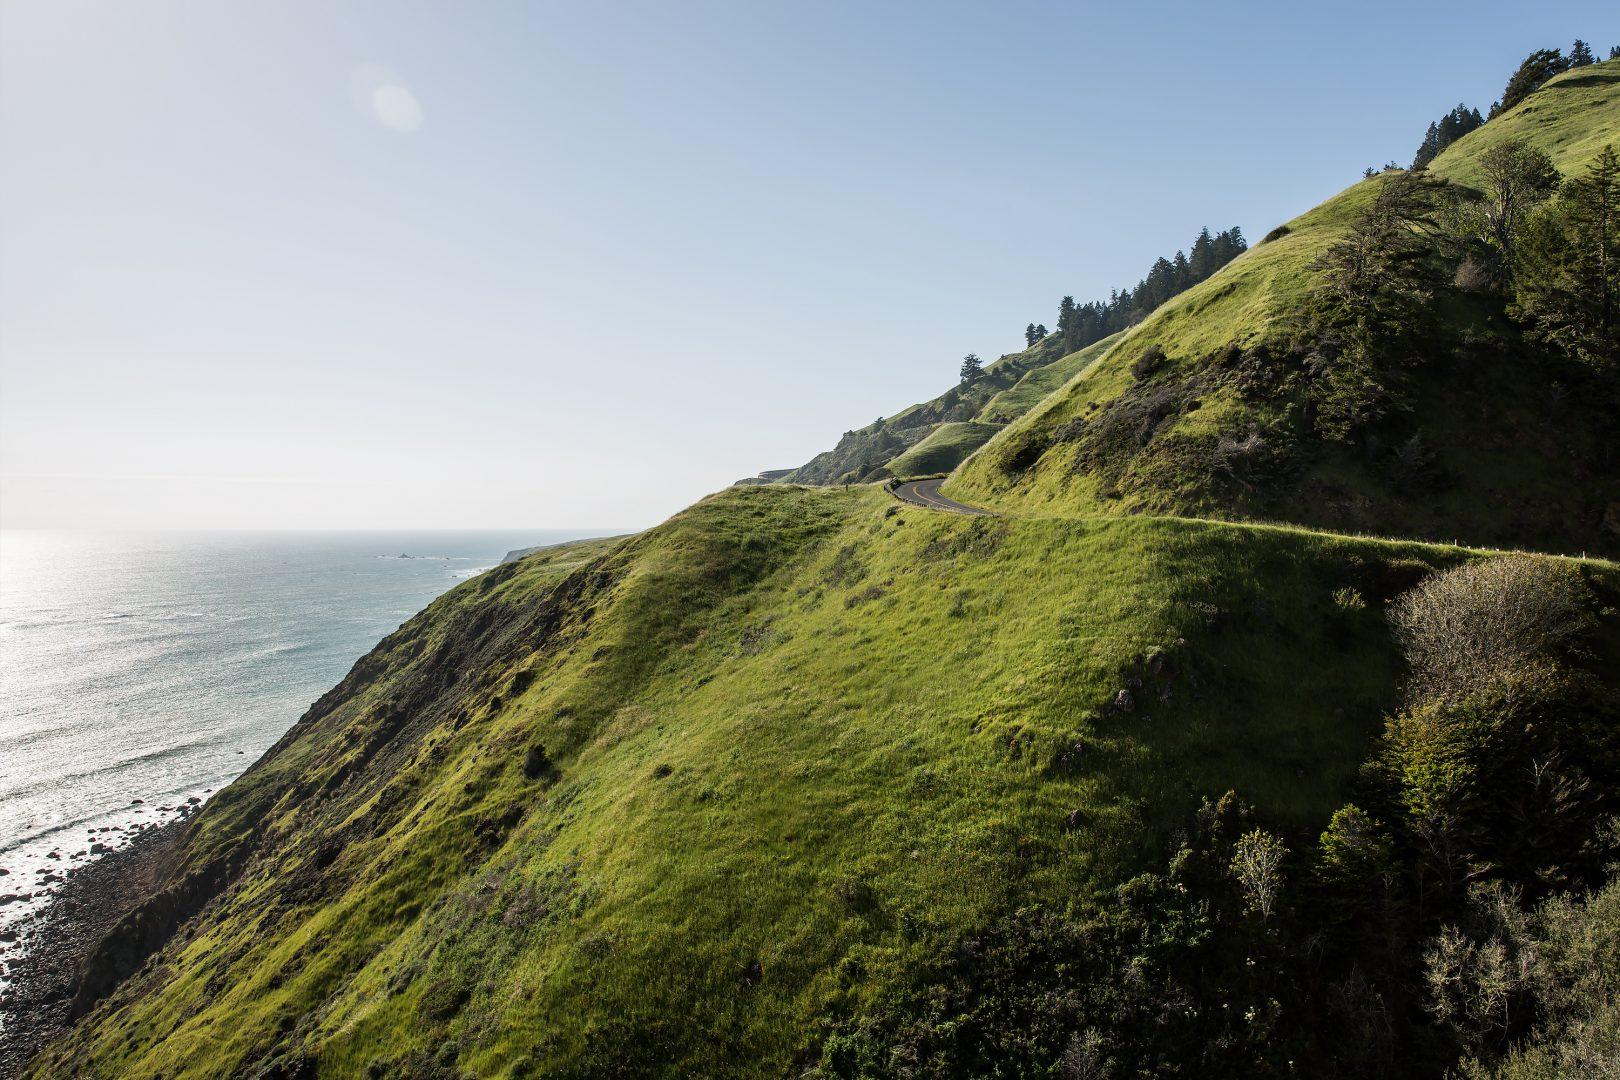 Highway 1 north of San Francisco